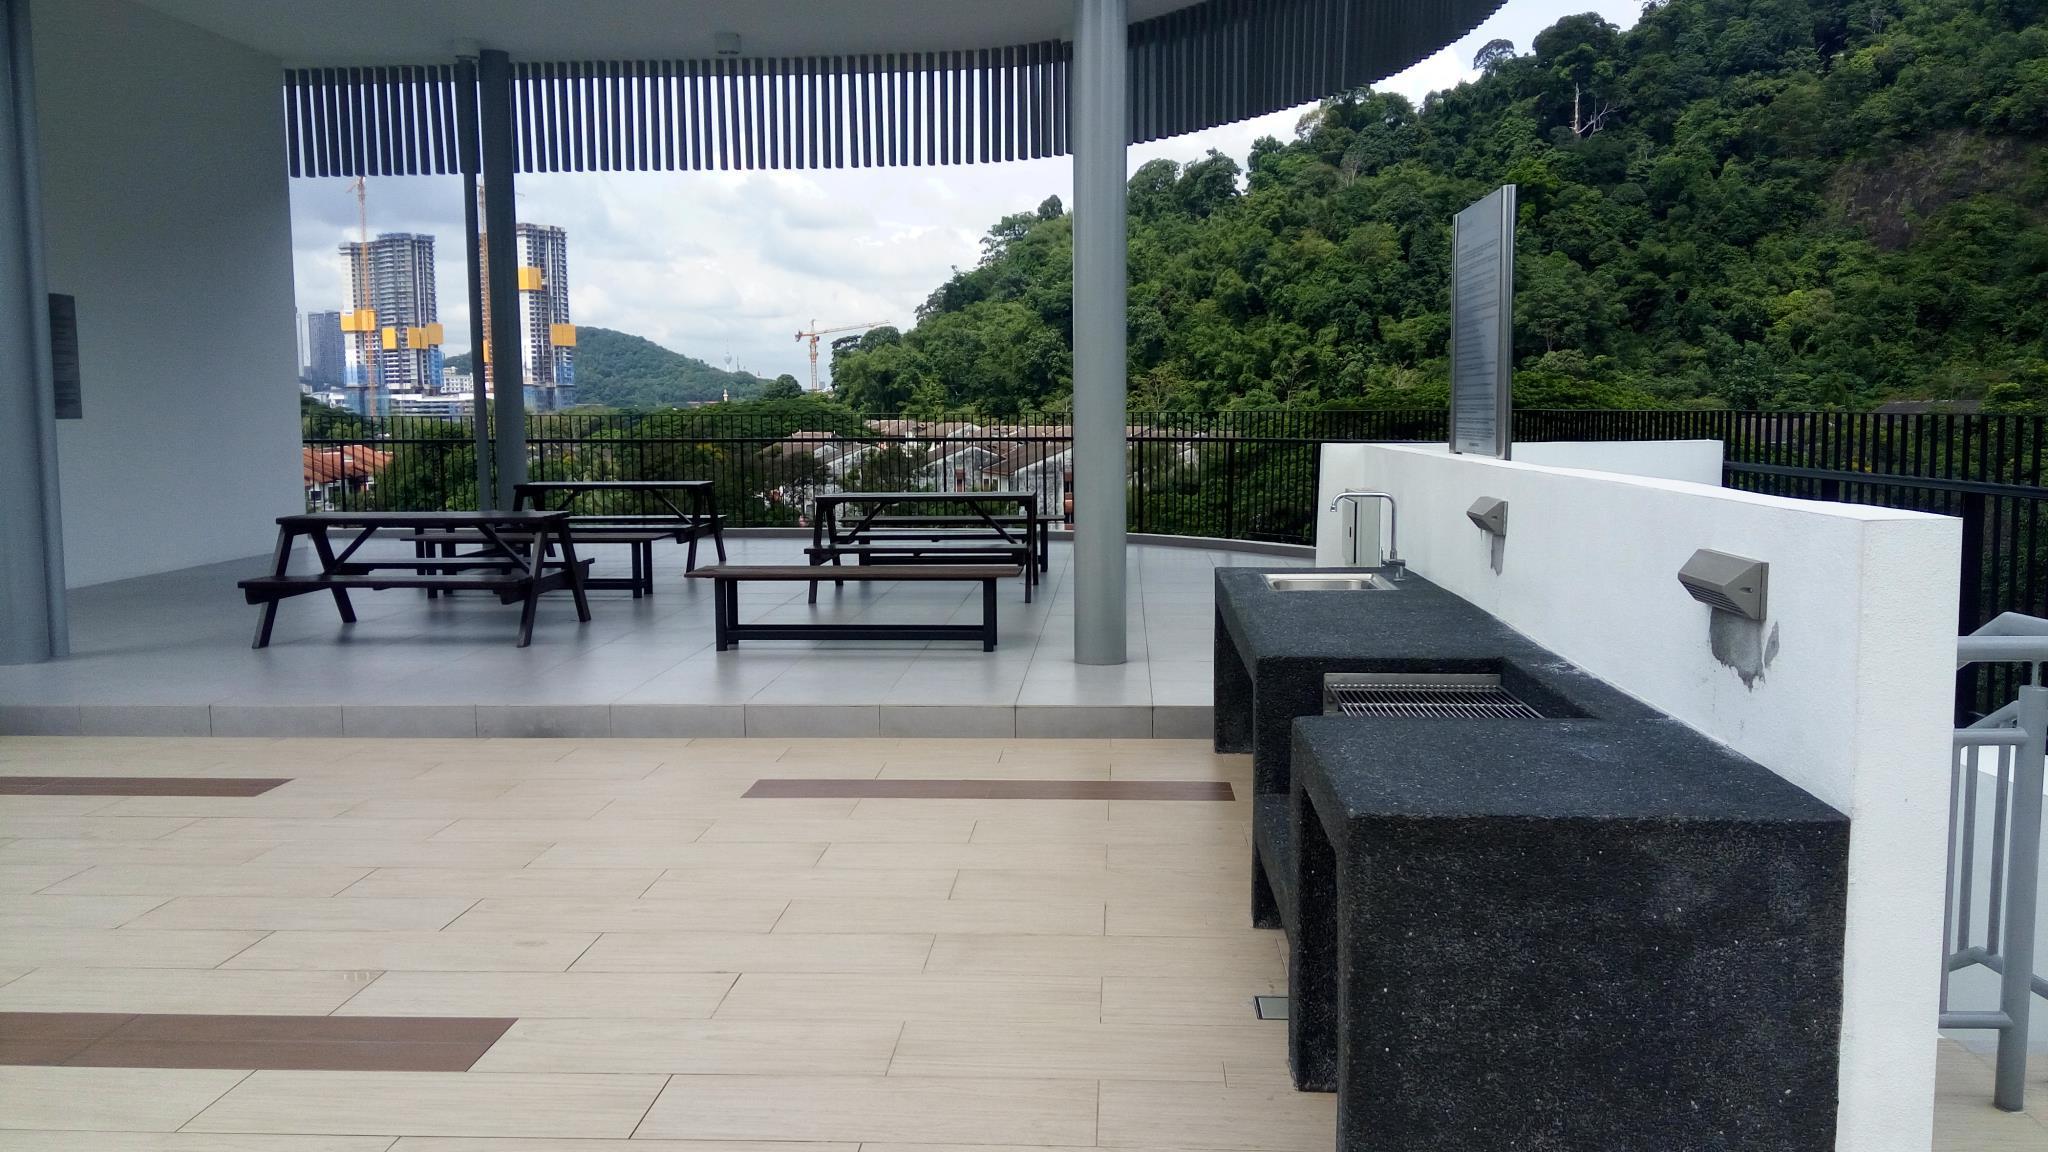 Harta8 Vacation Home @ Nadayu62 Melawati, Kuala Lumpur